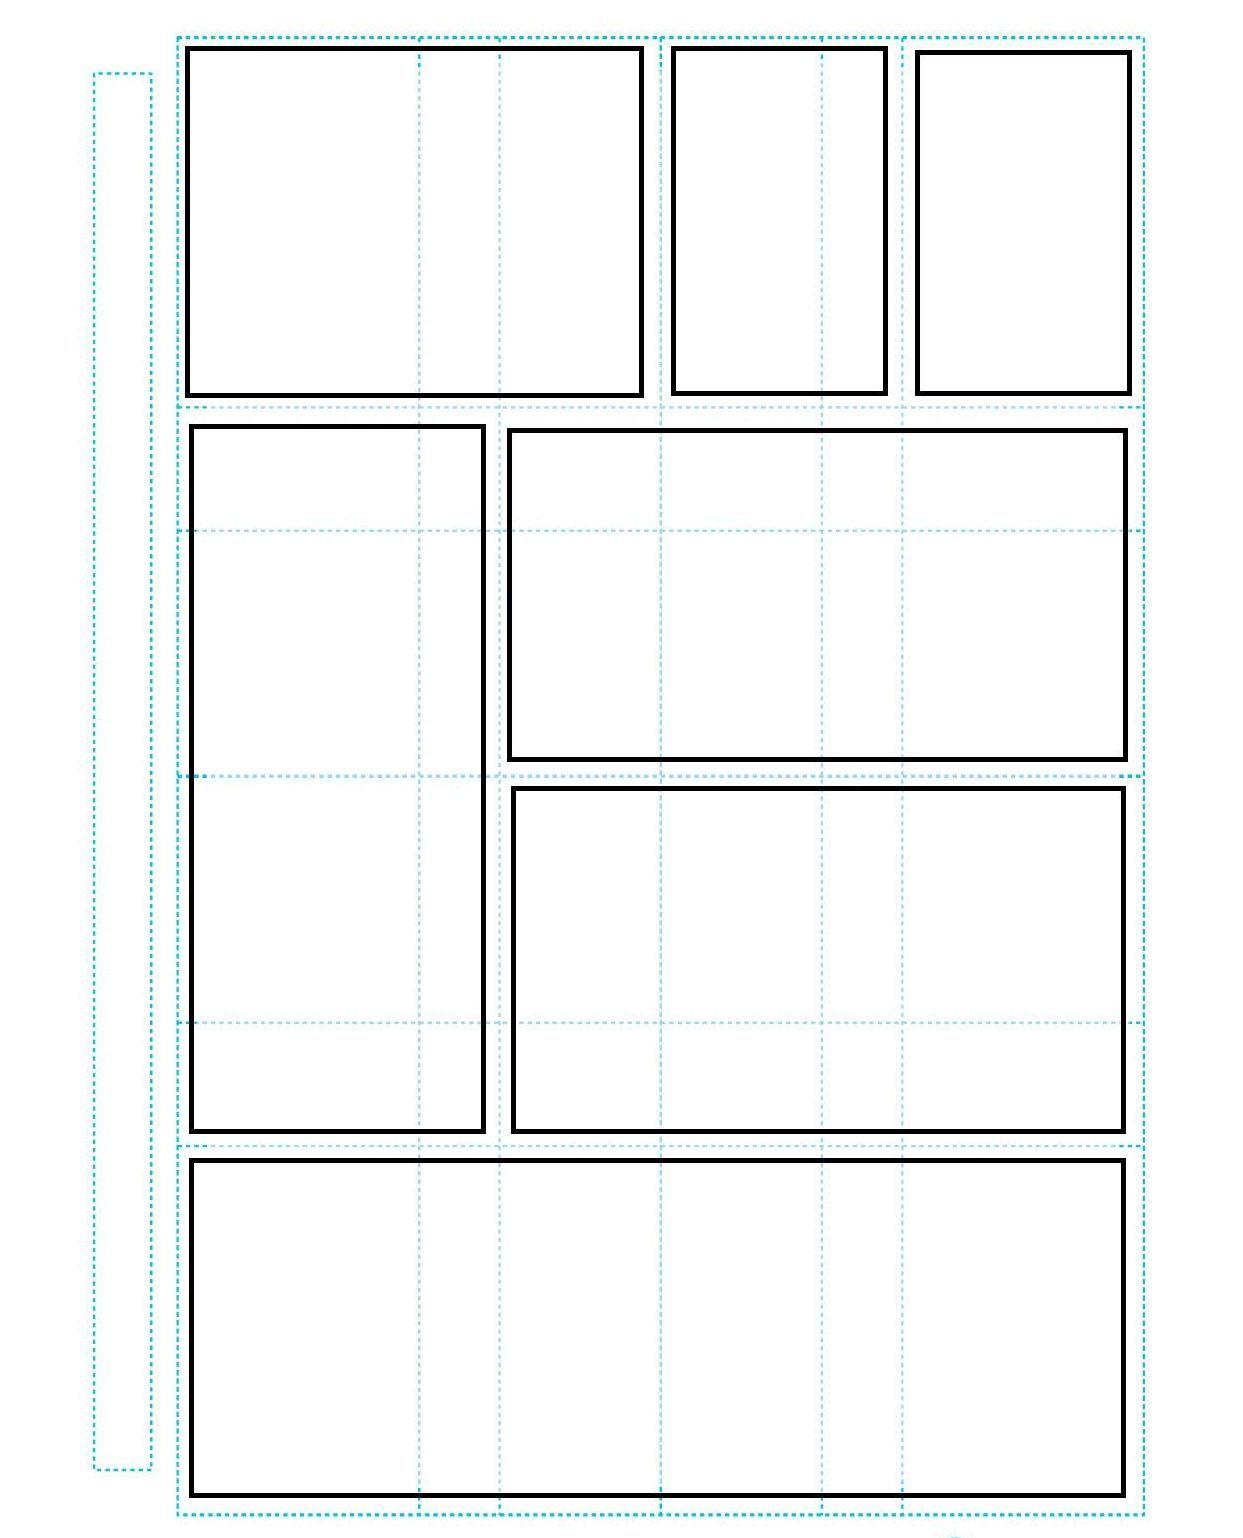 Blank Comic Book Pages Free Printable Calendar Templates Comic Book Pages Blank Comic Book Pages Blank Comic Book